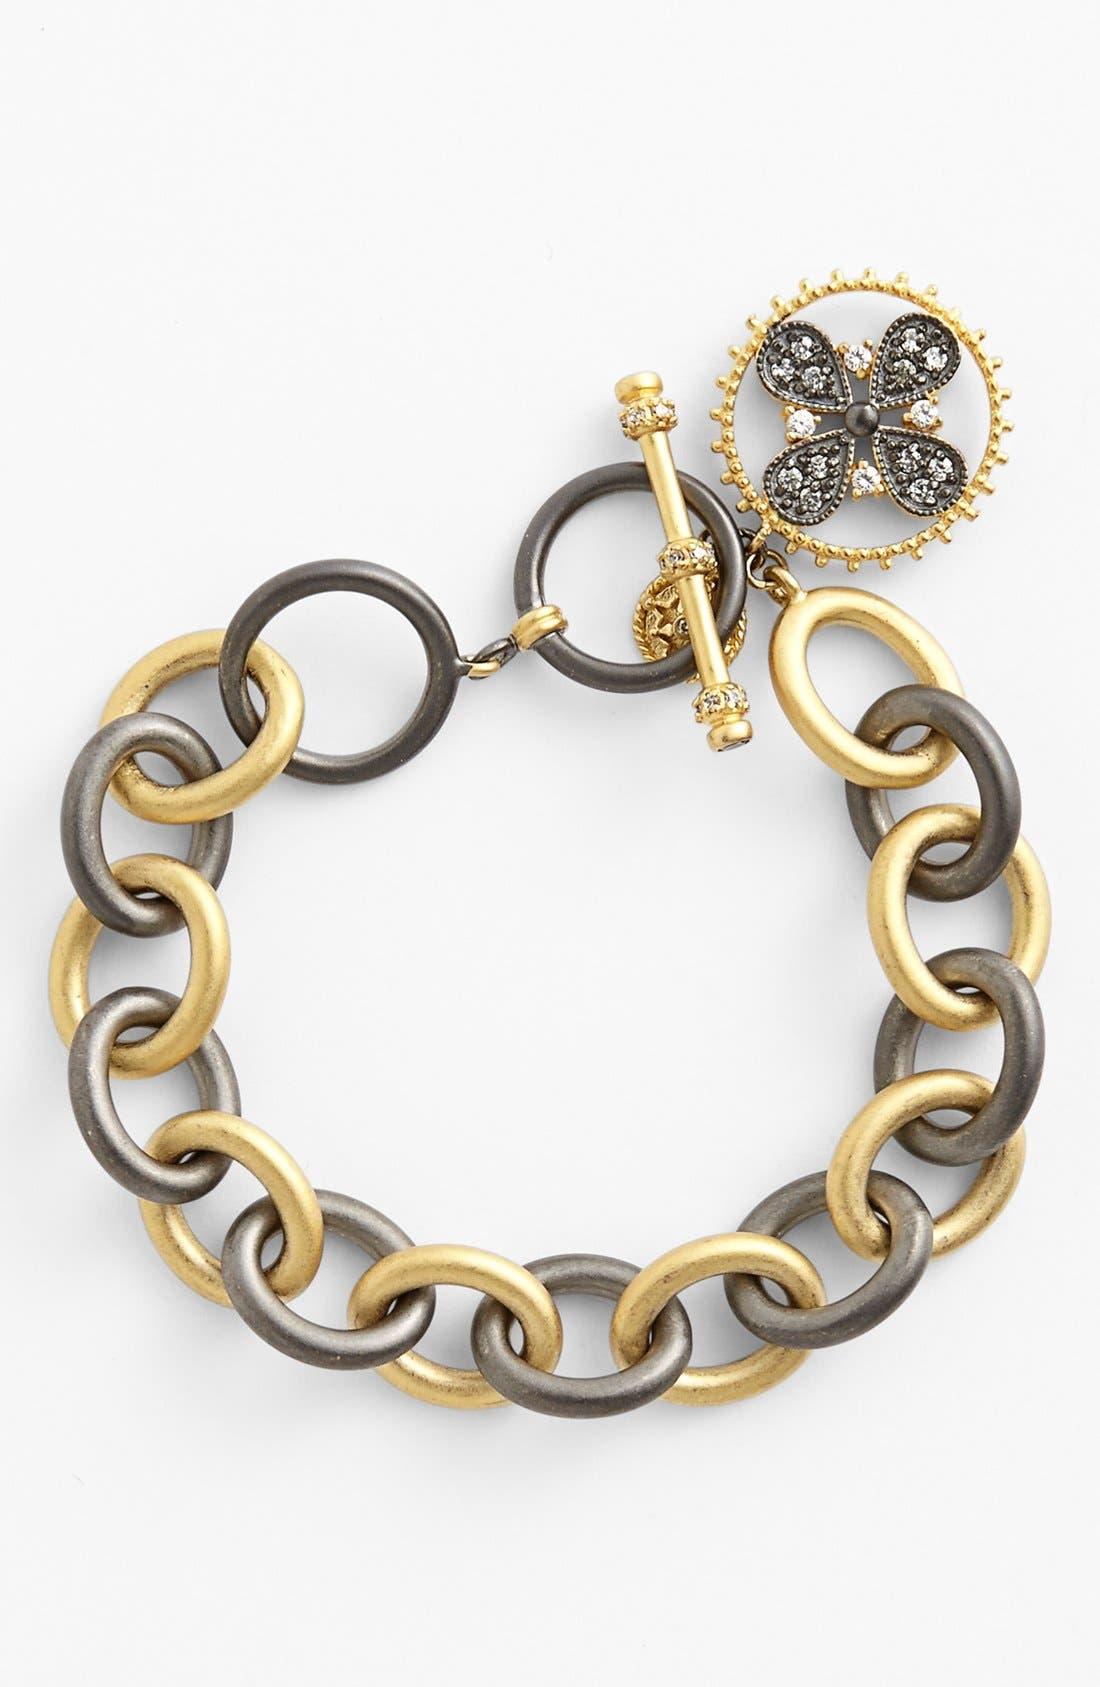 Alternate Image 1 Selected - FREIDA ROTHMAN 'Hamptons' Clover Charm Toggle Bracelet